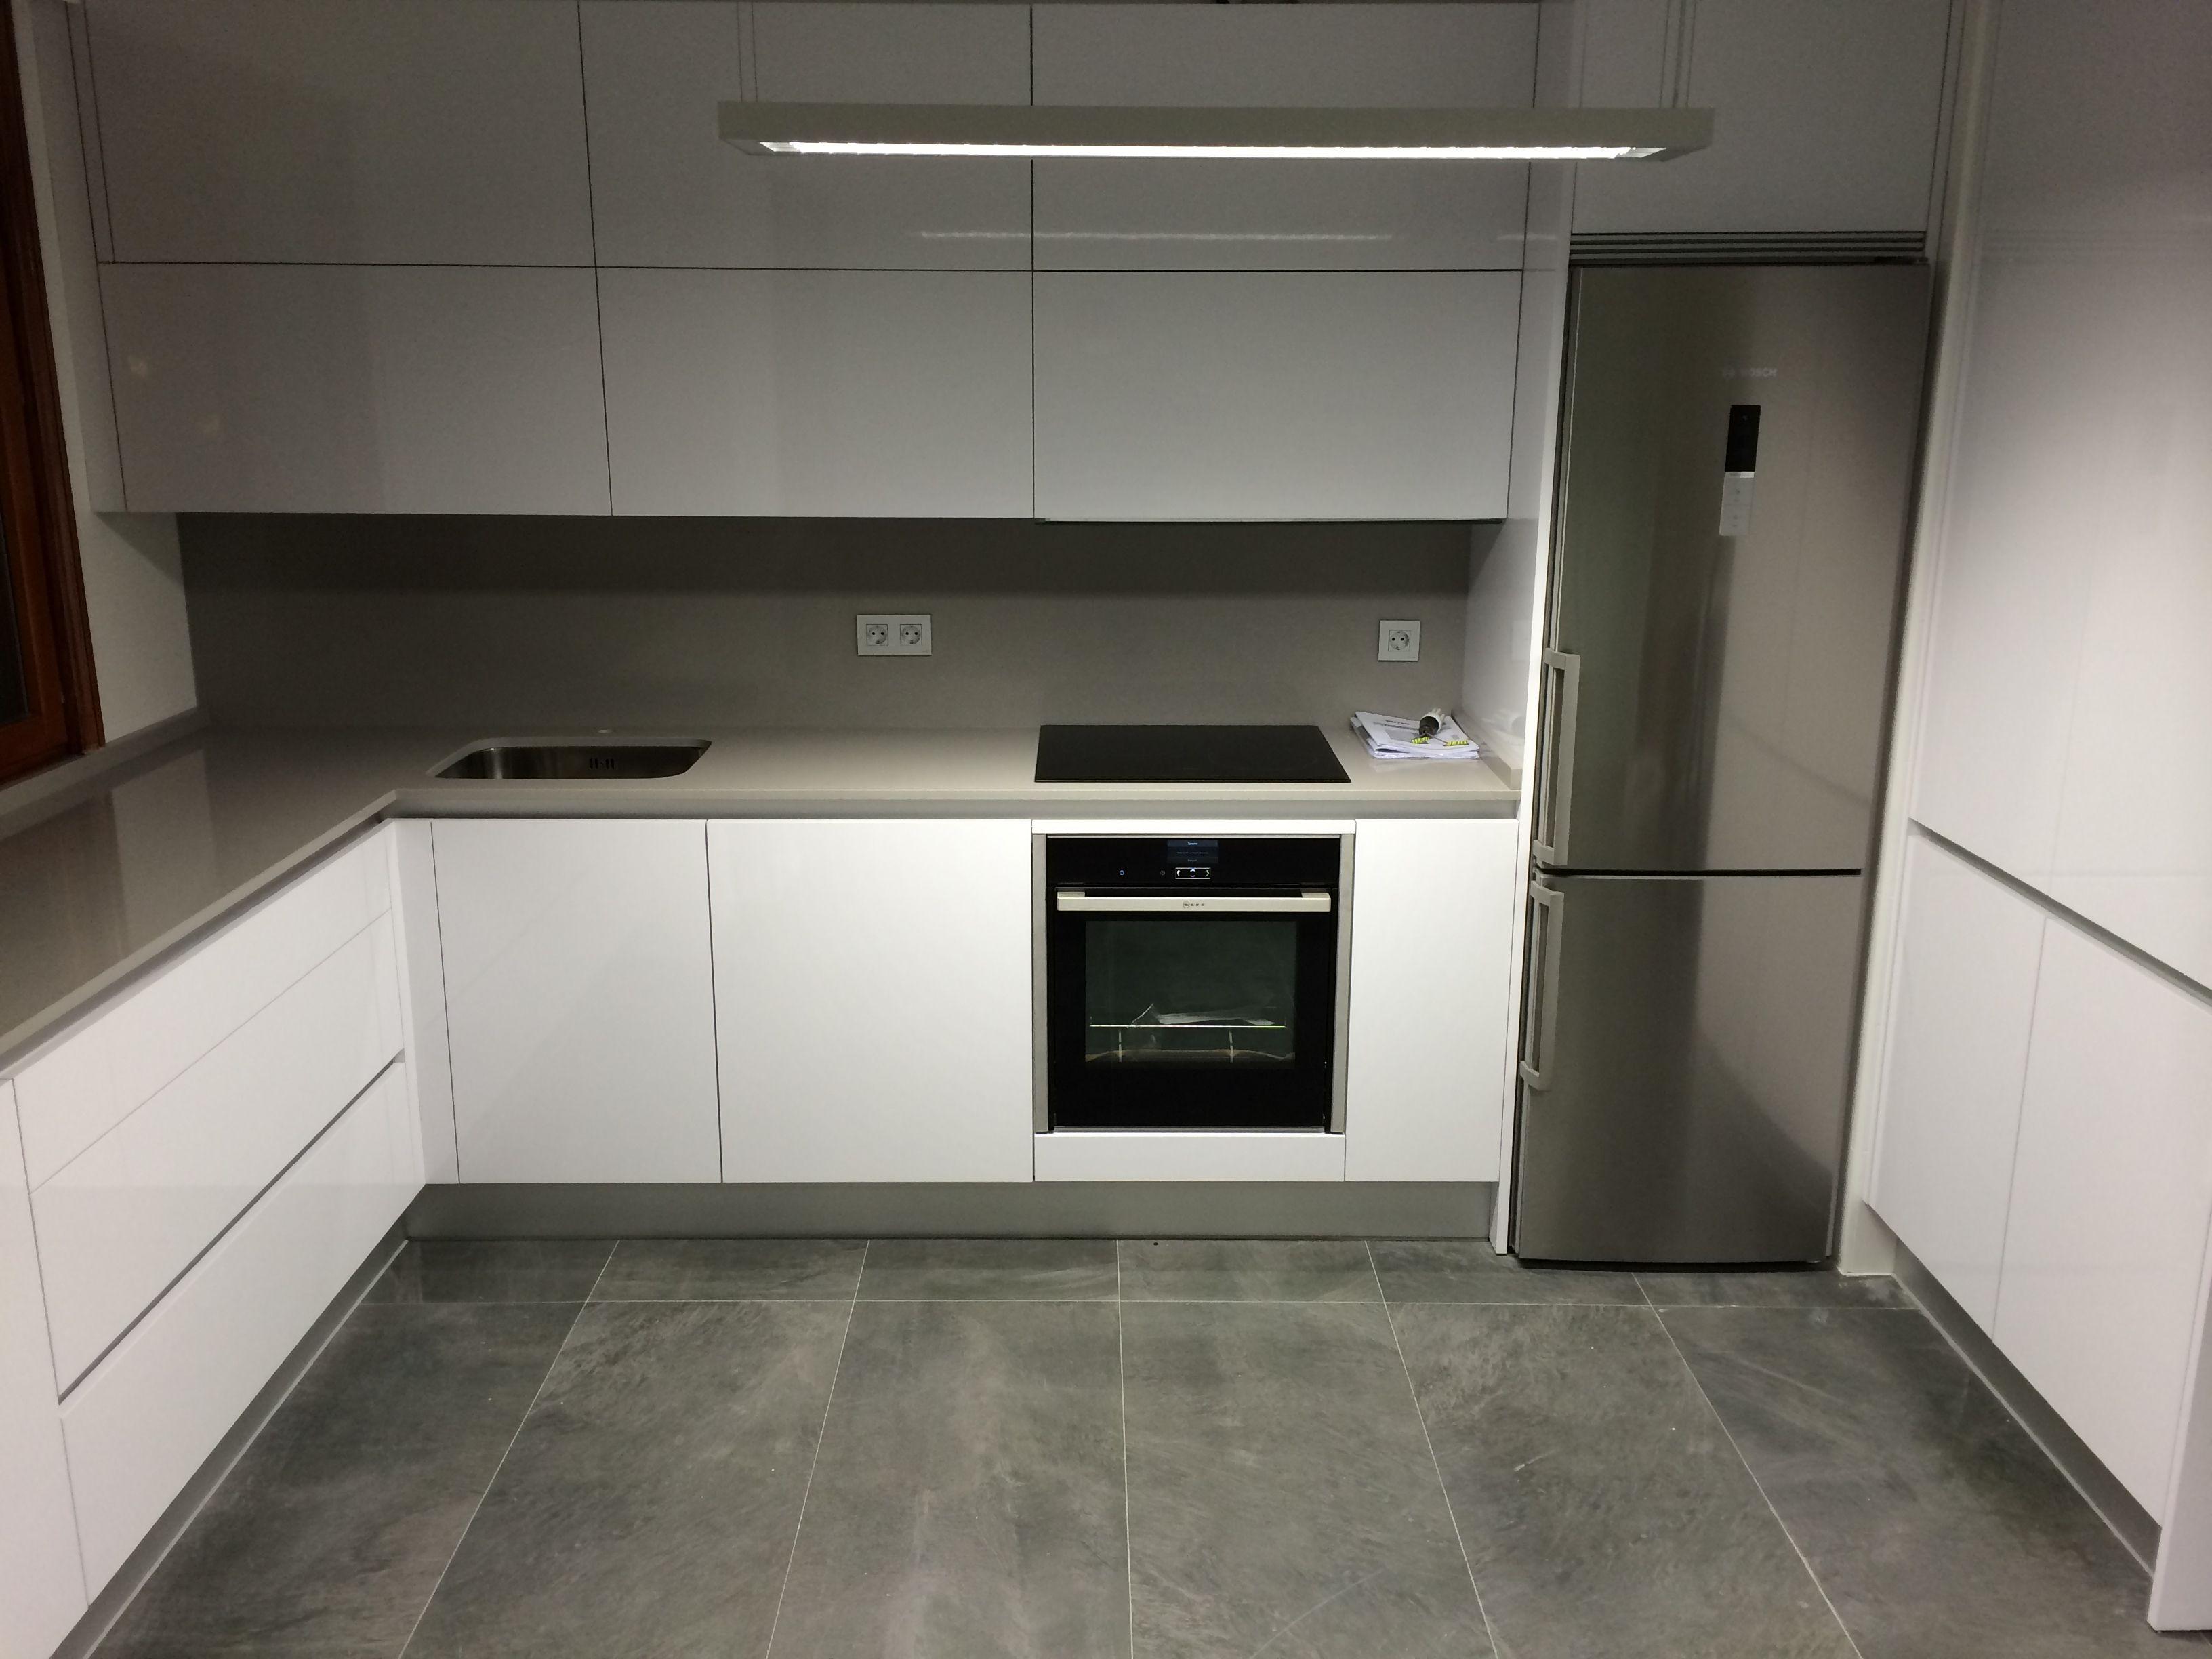 Cocina moderna blanca y solo gris oscuro cocinas for Color credence cocina blanca